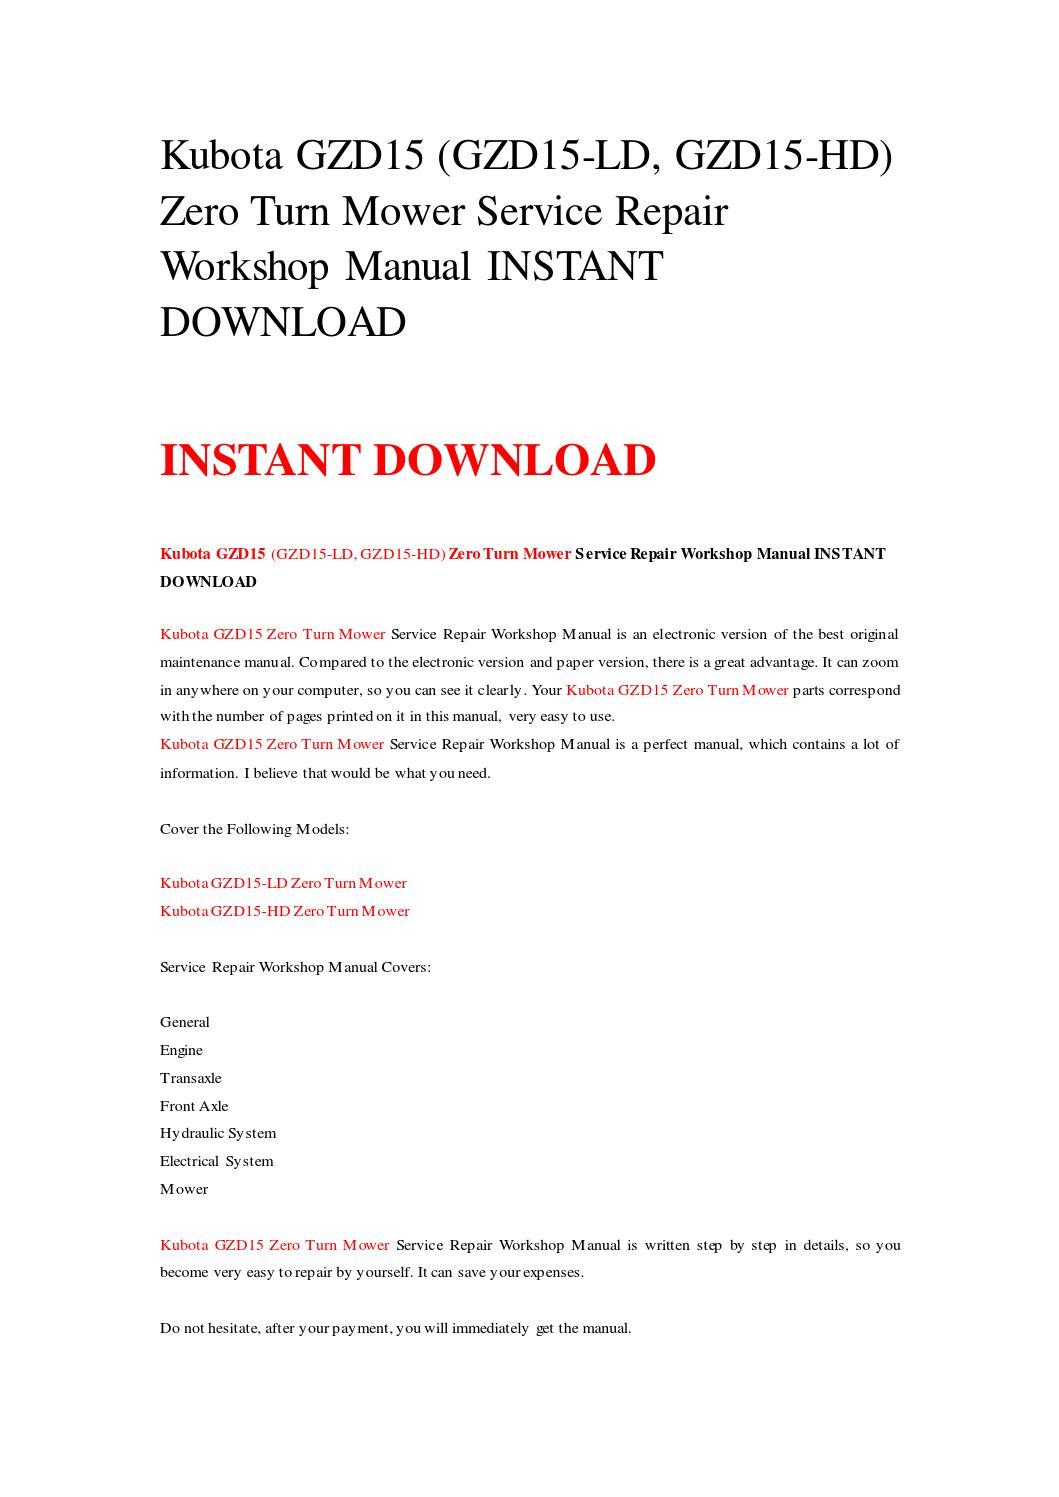 Kubota gzd15 (gzd15 ld, gzd15 hd) zero turn mower service repair workshop  manual instant download by rrrepairmanual - issuu